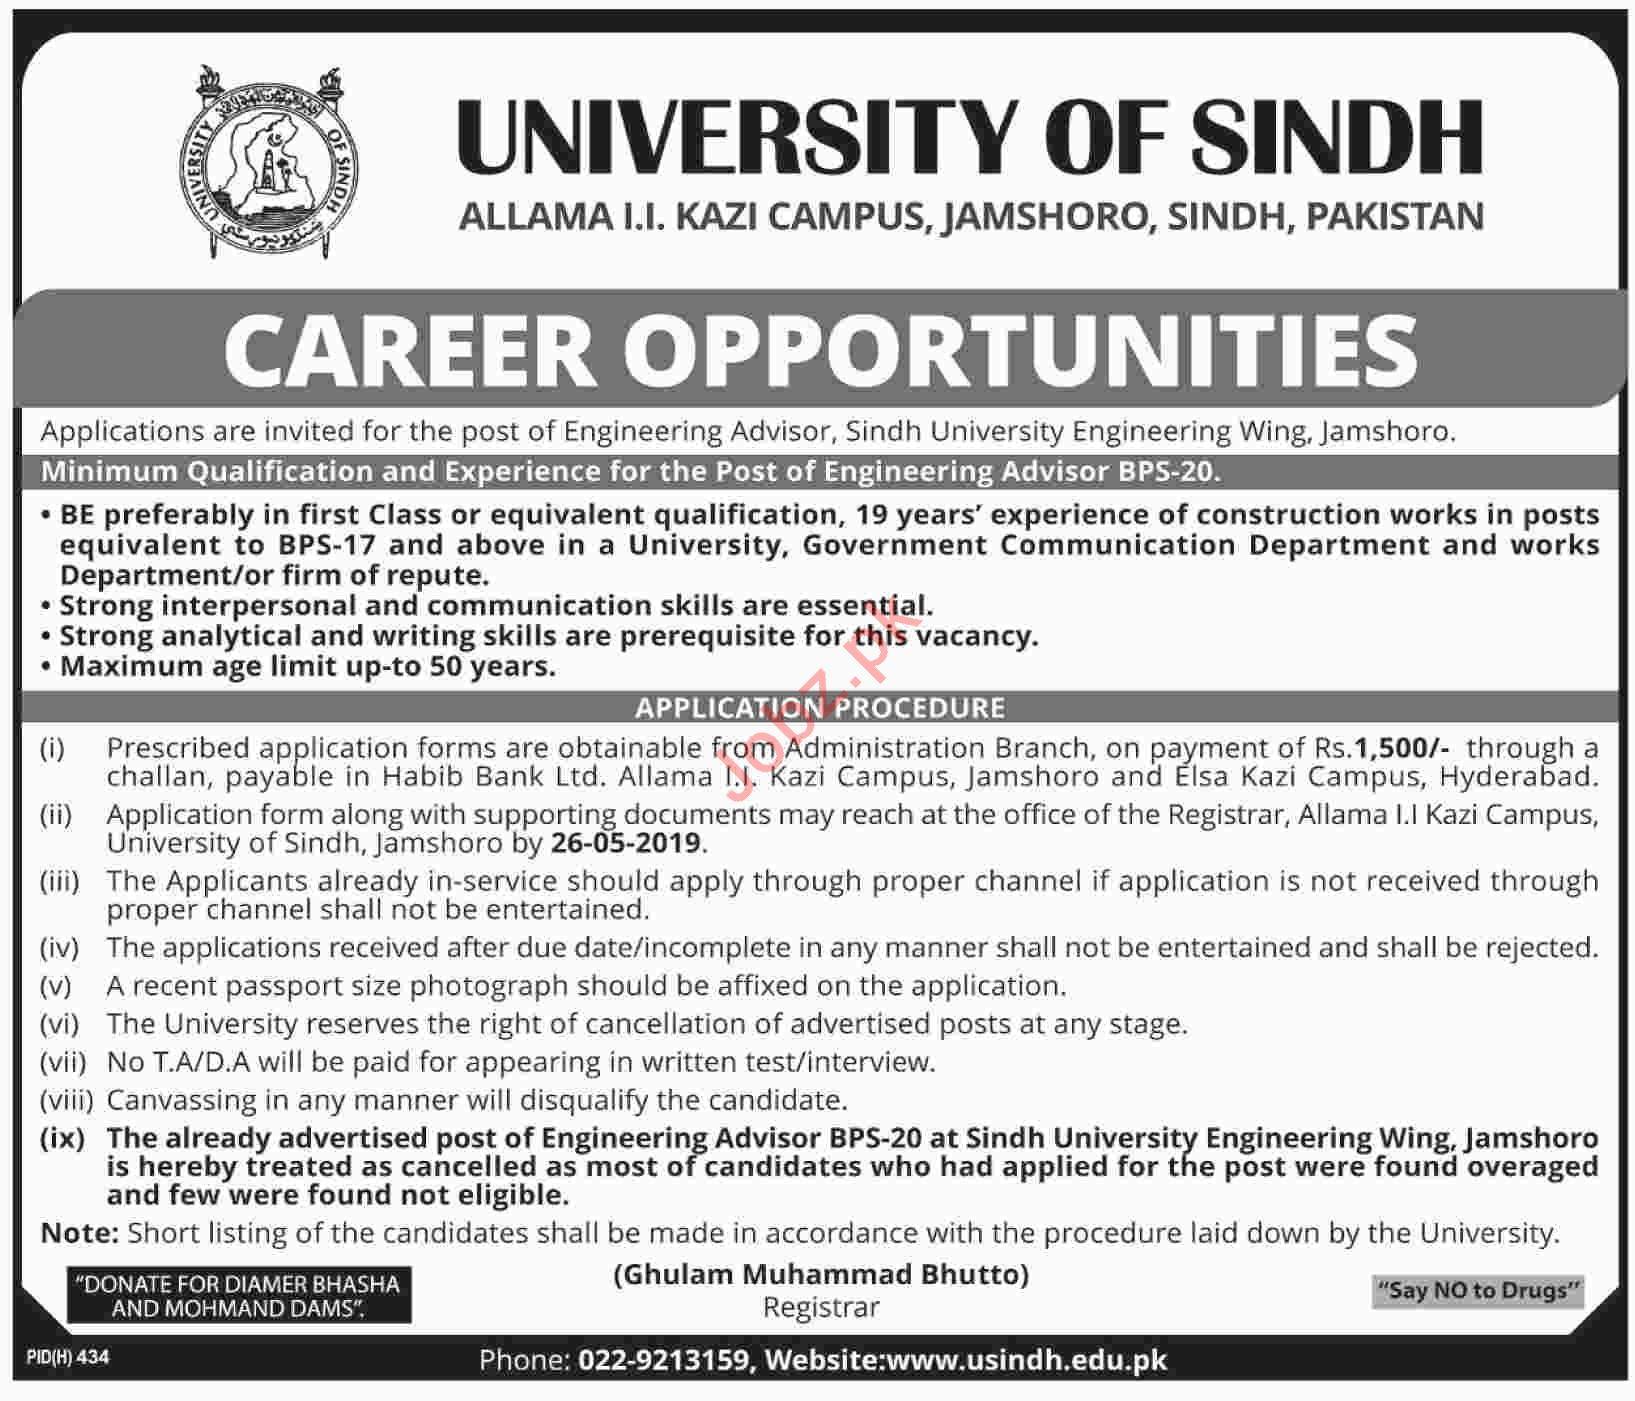 University of Sindh Jamshoro Jobs for Engineering Advisor